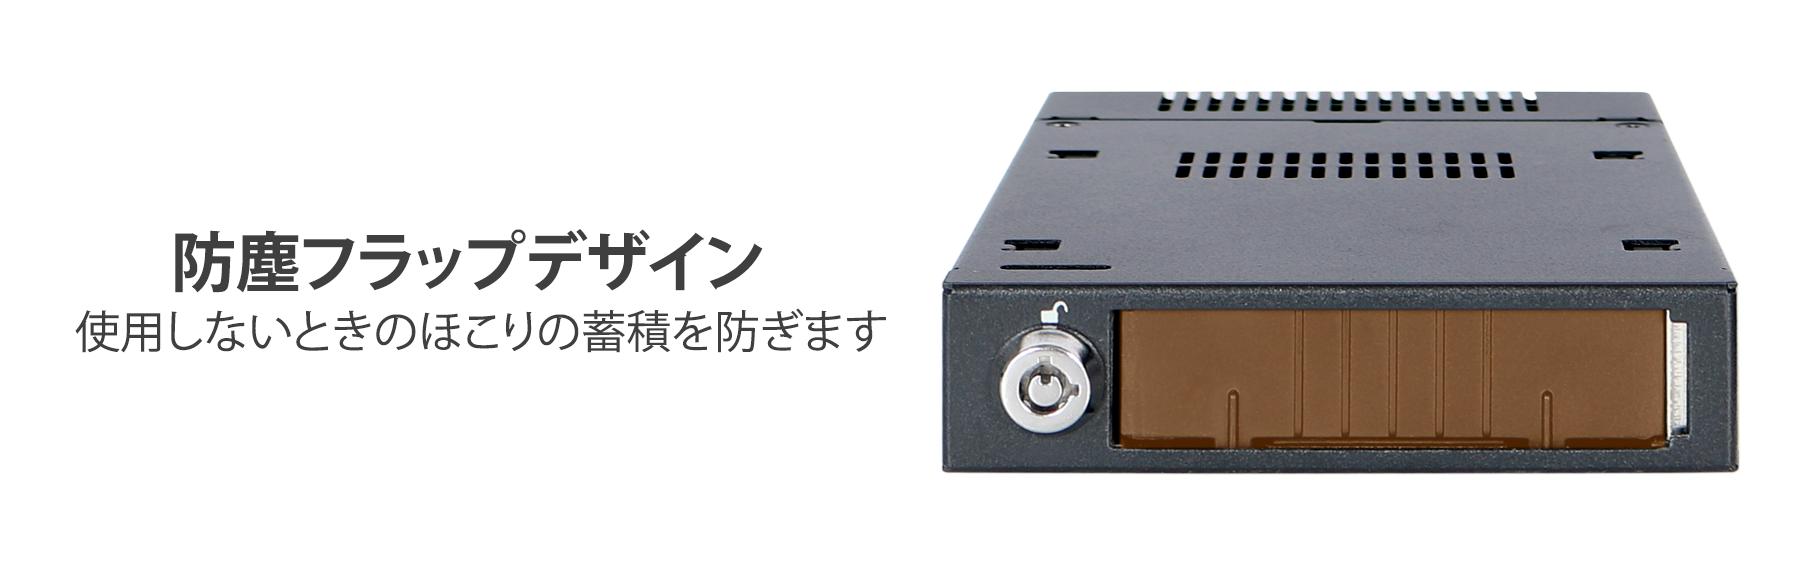 mb601vk-1b anti-dust flap design